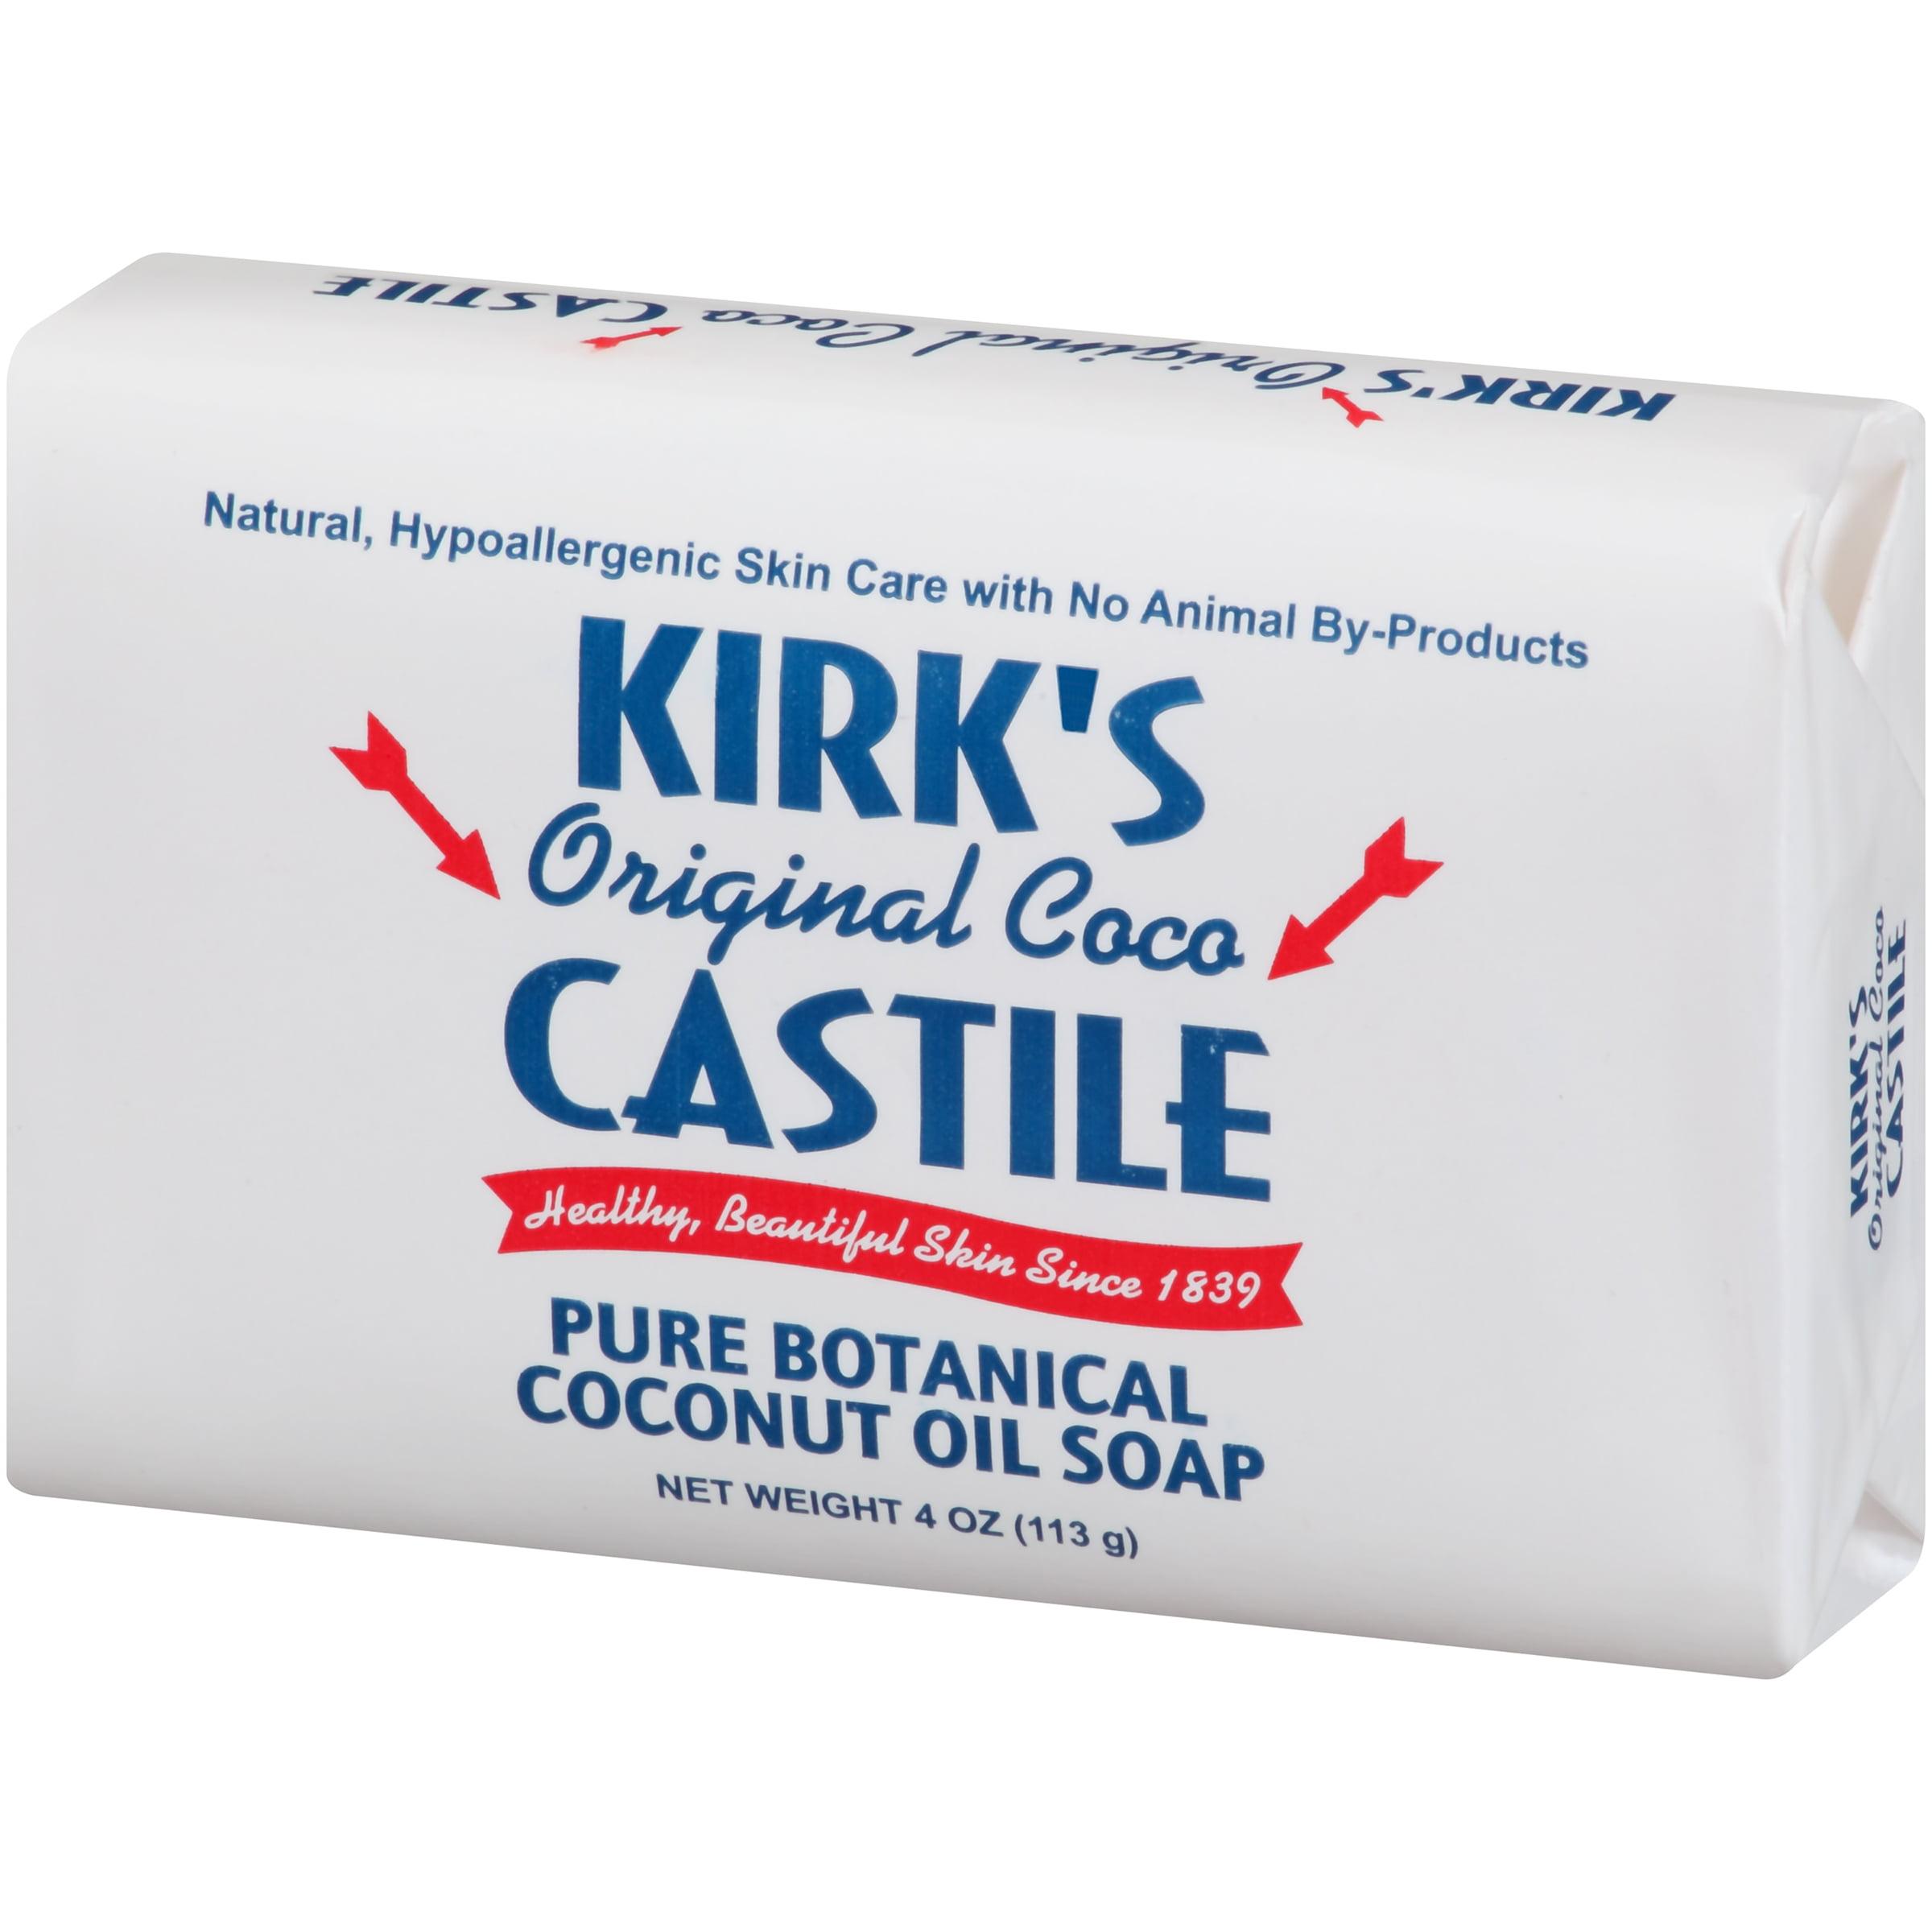 Kirk\'s Original Coco Castile Coconut Oil Soap, 4.0 OZ - Walmart.com